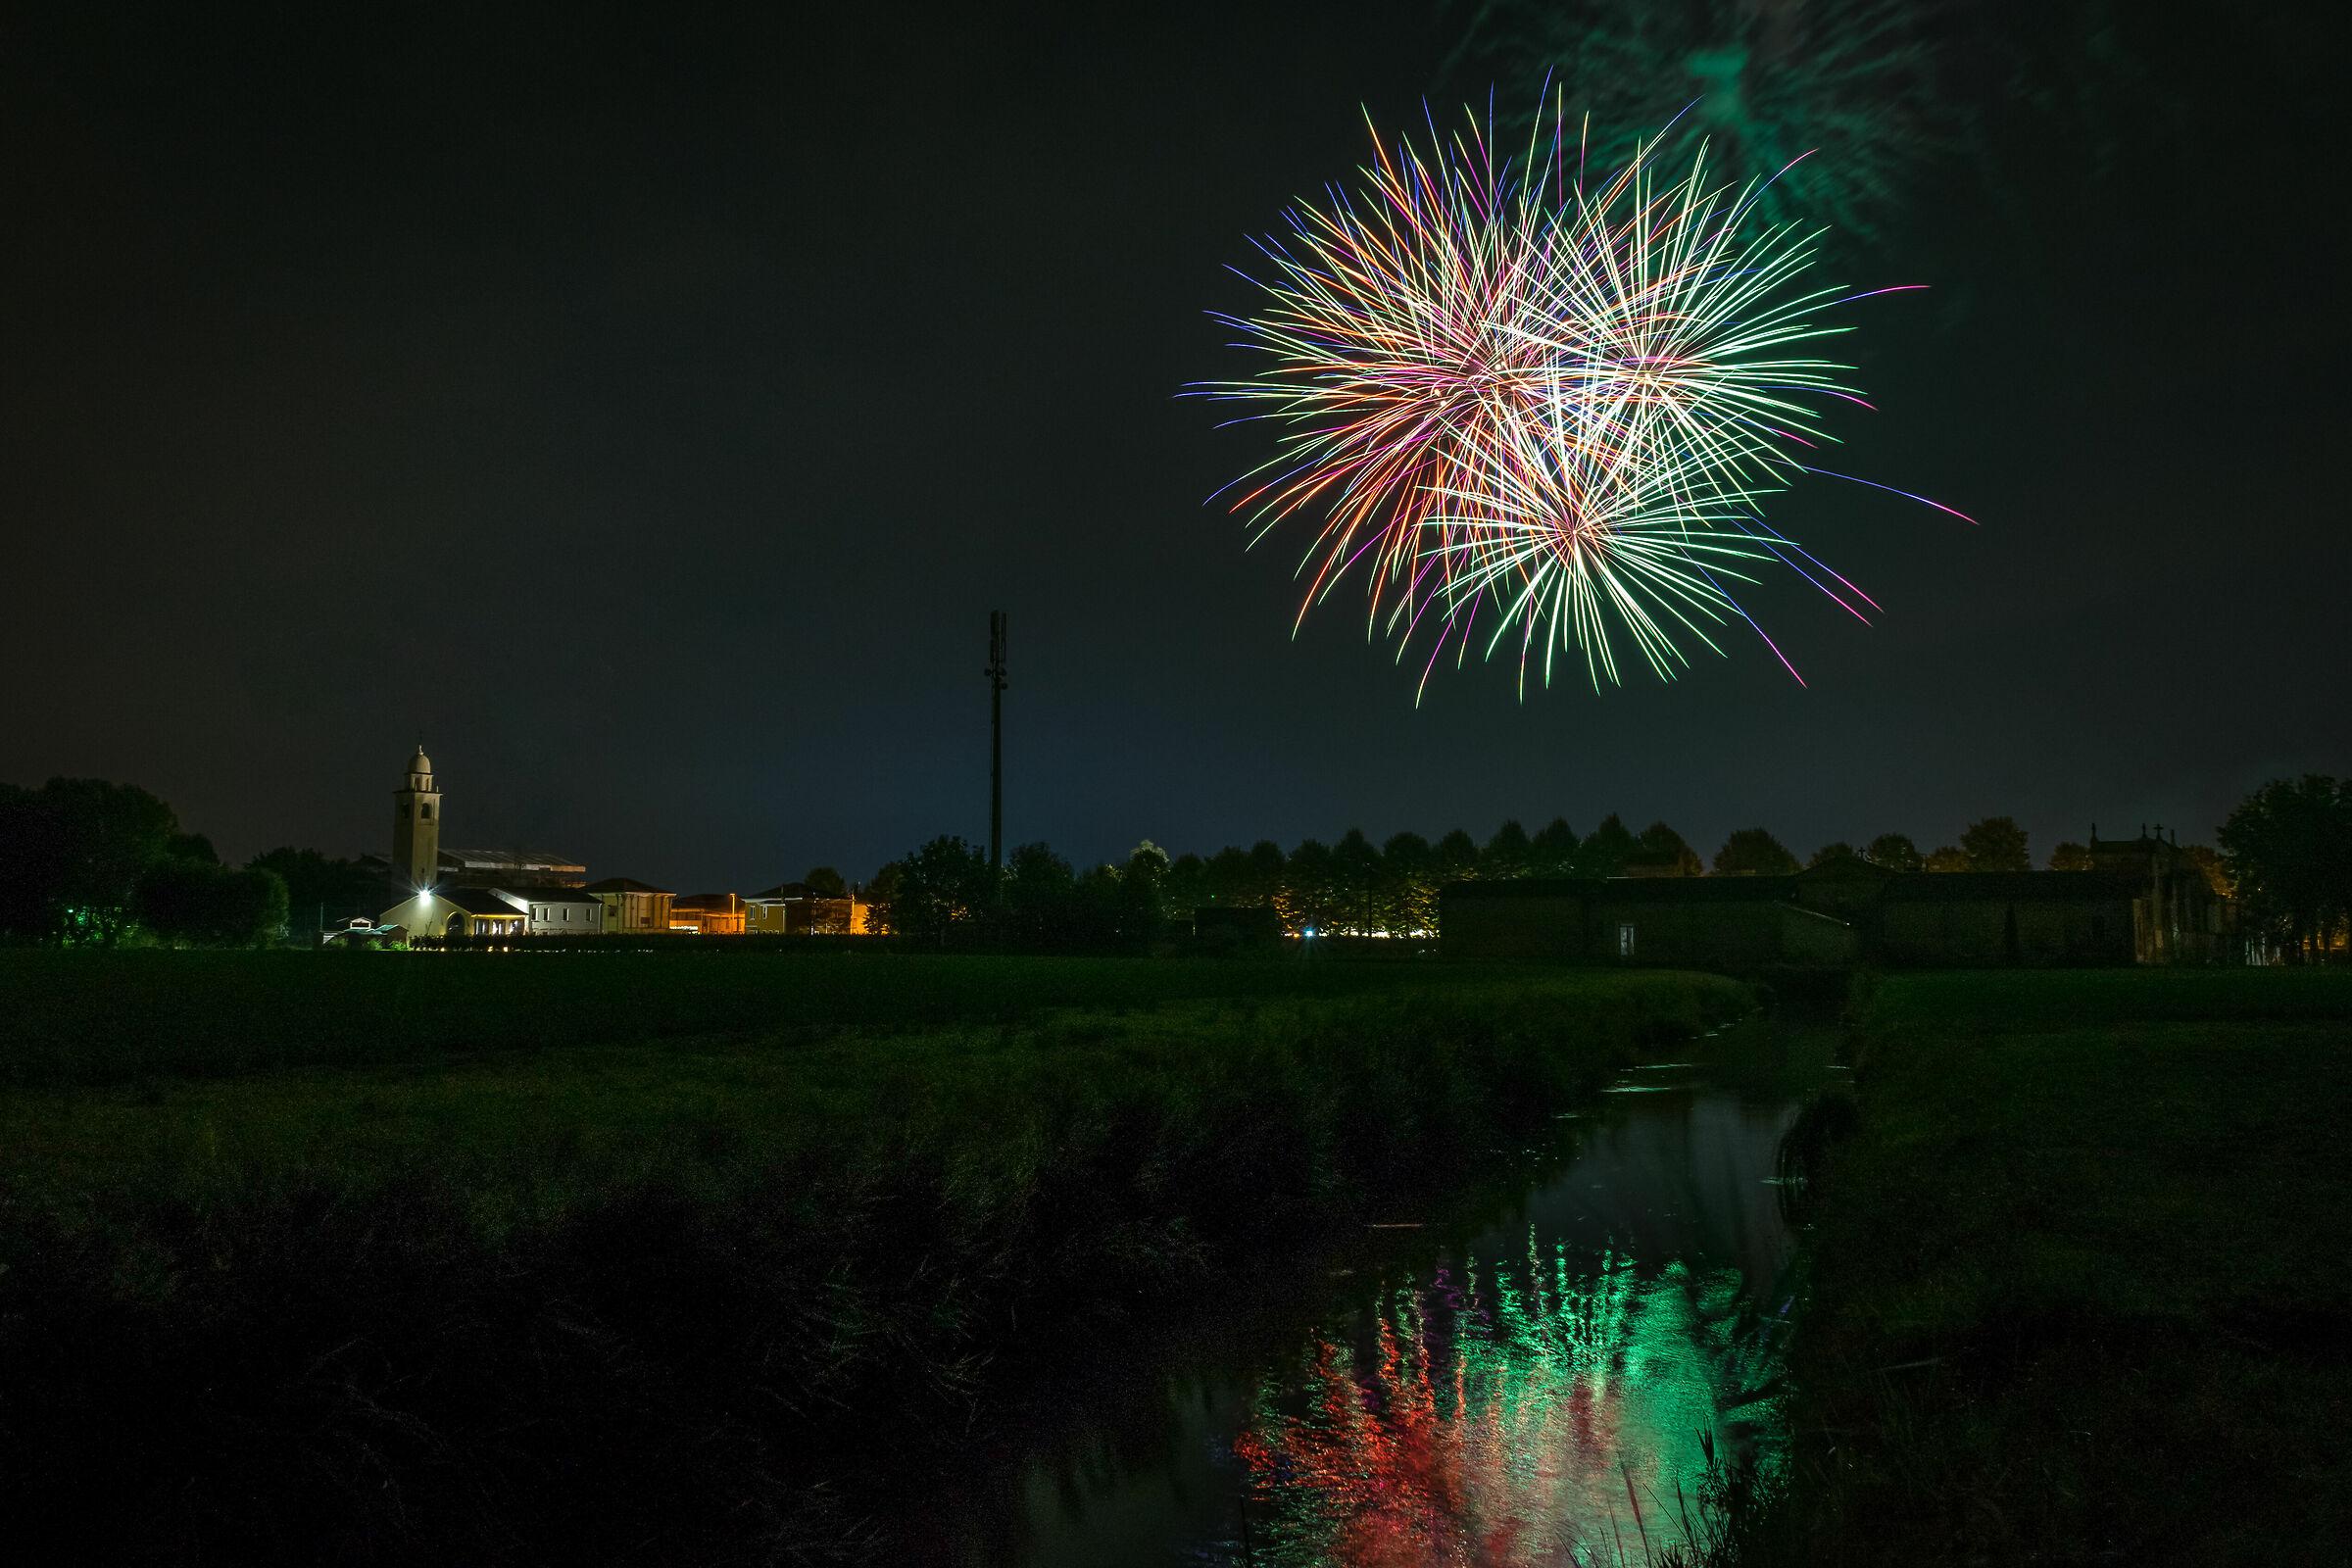 Fireworks 2...